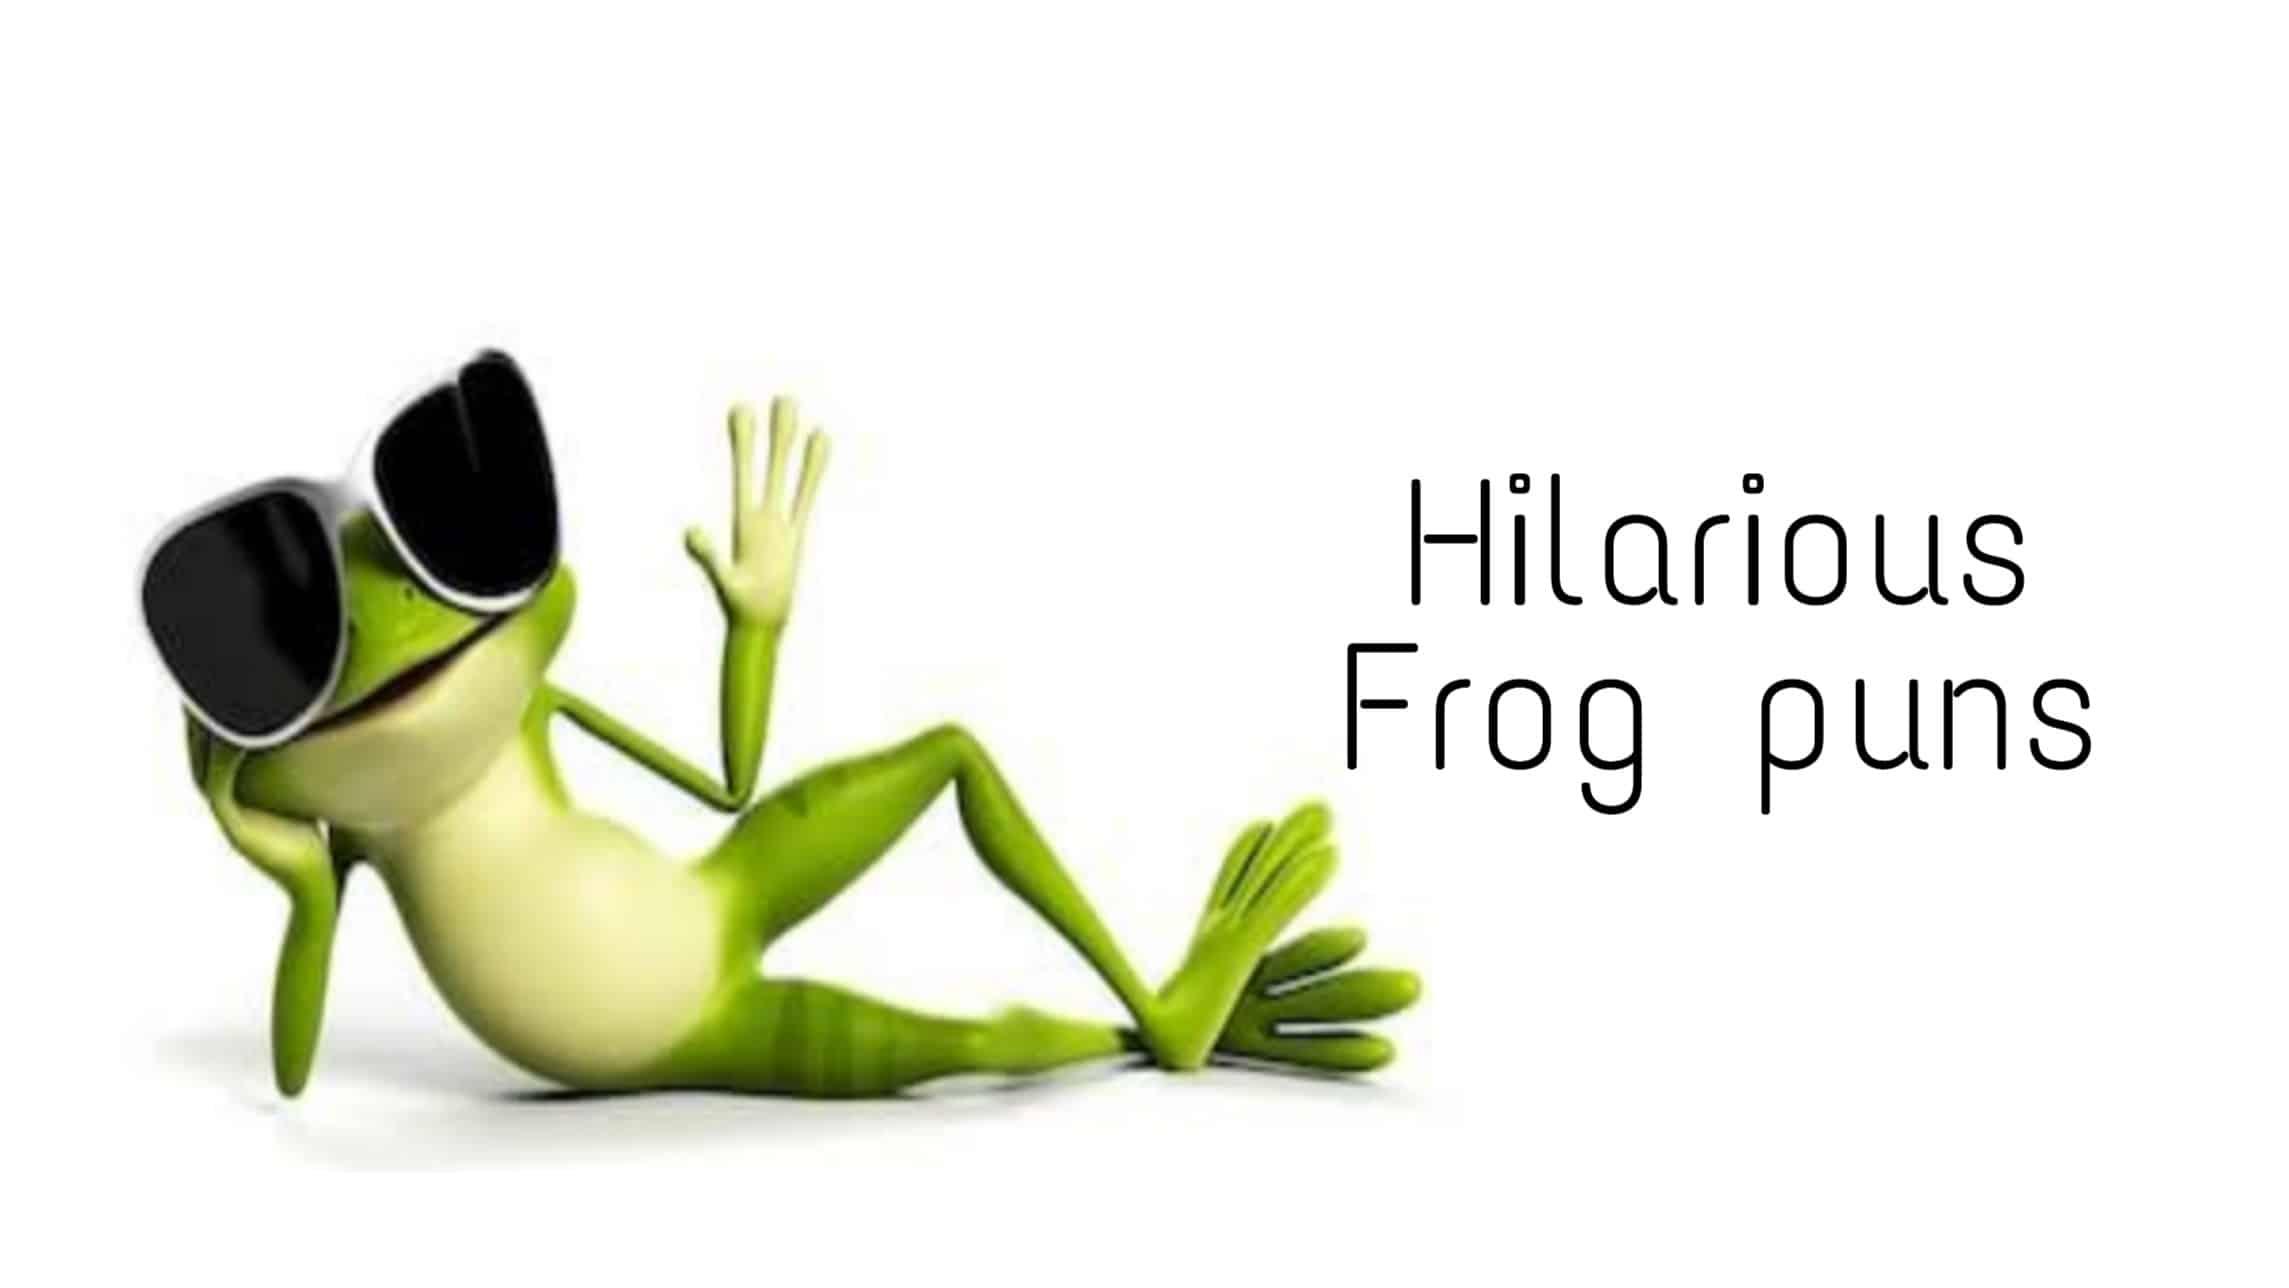 frog puns